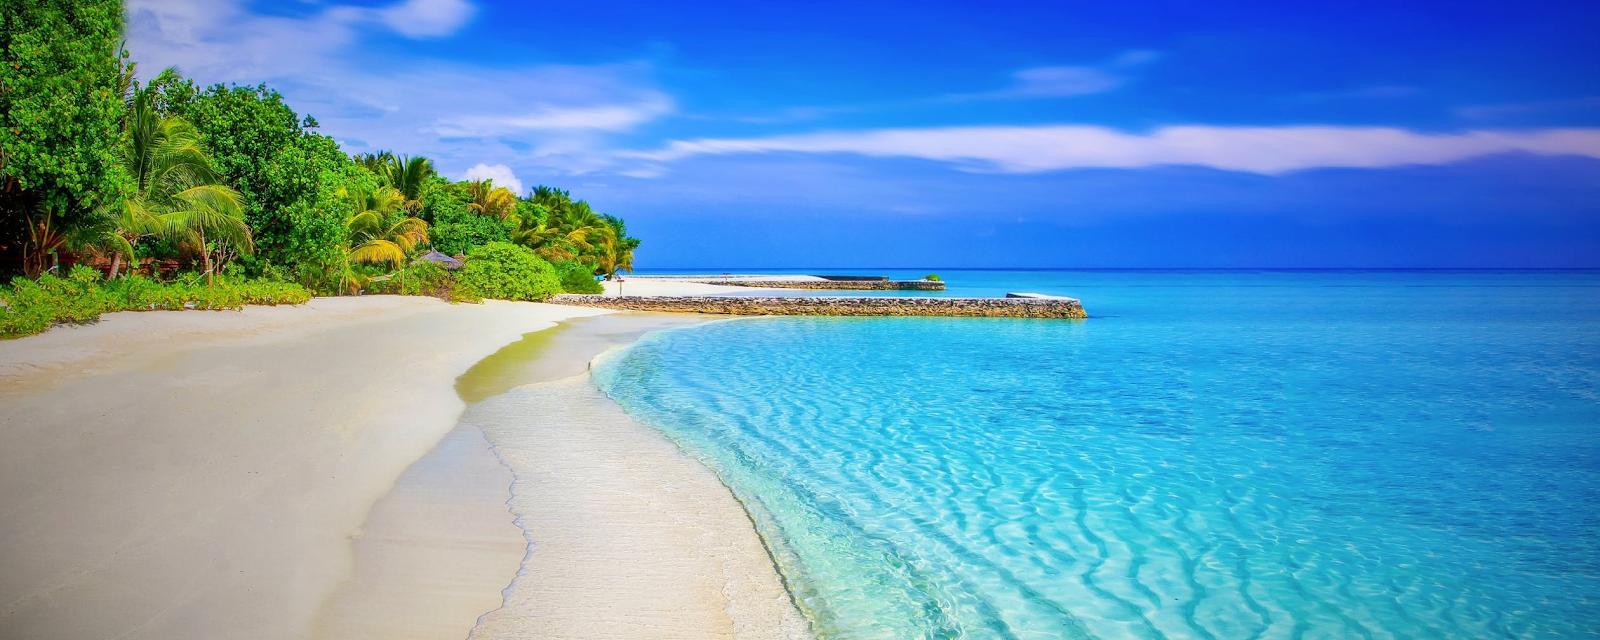 Ocean Landscape / Beach Scene